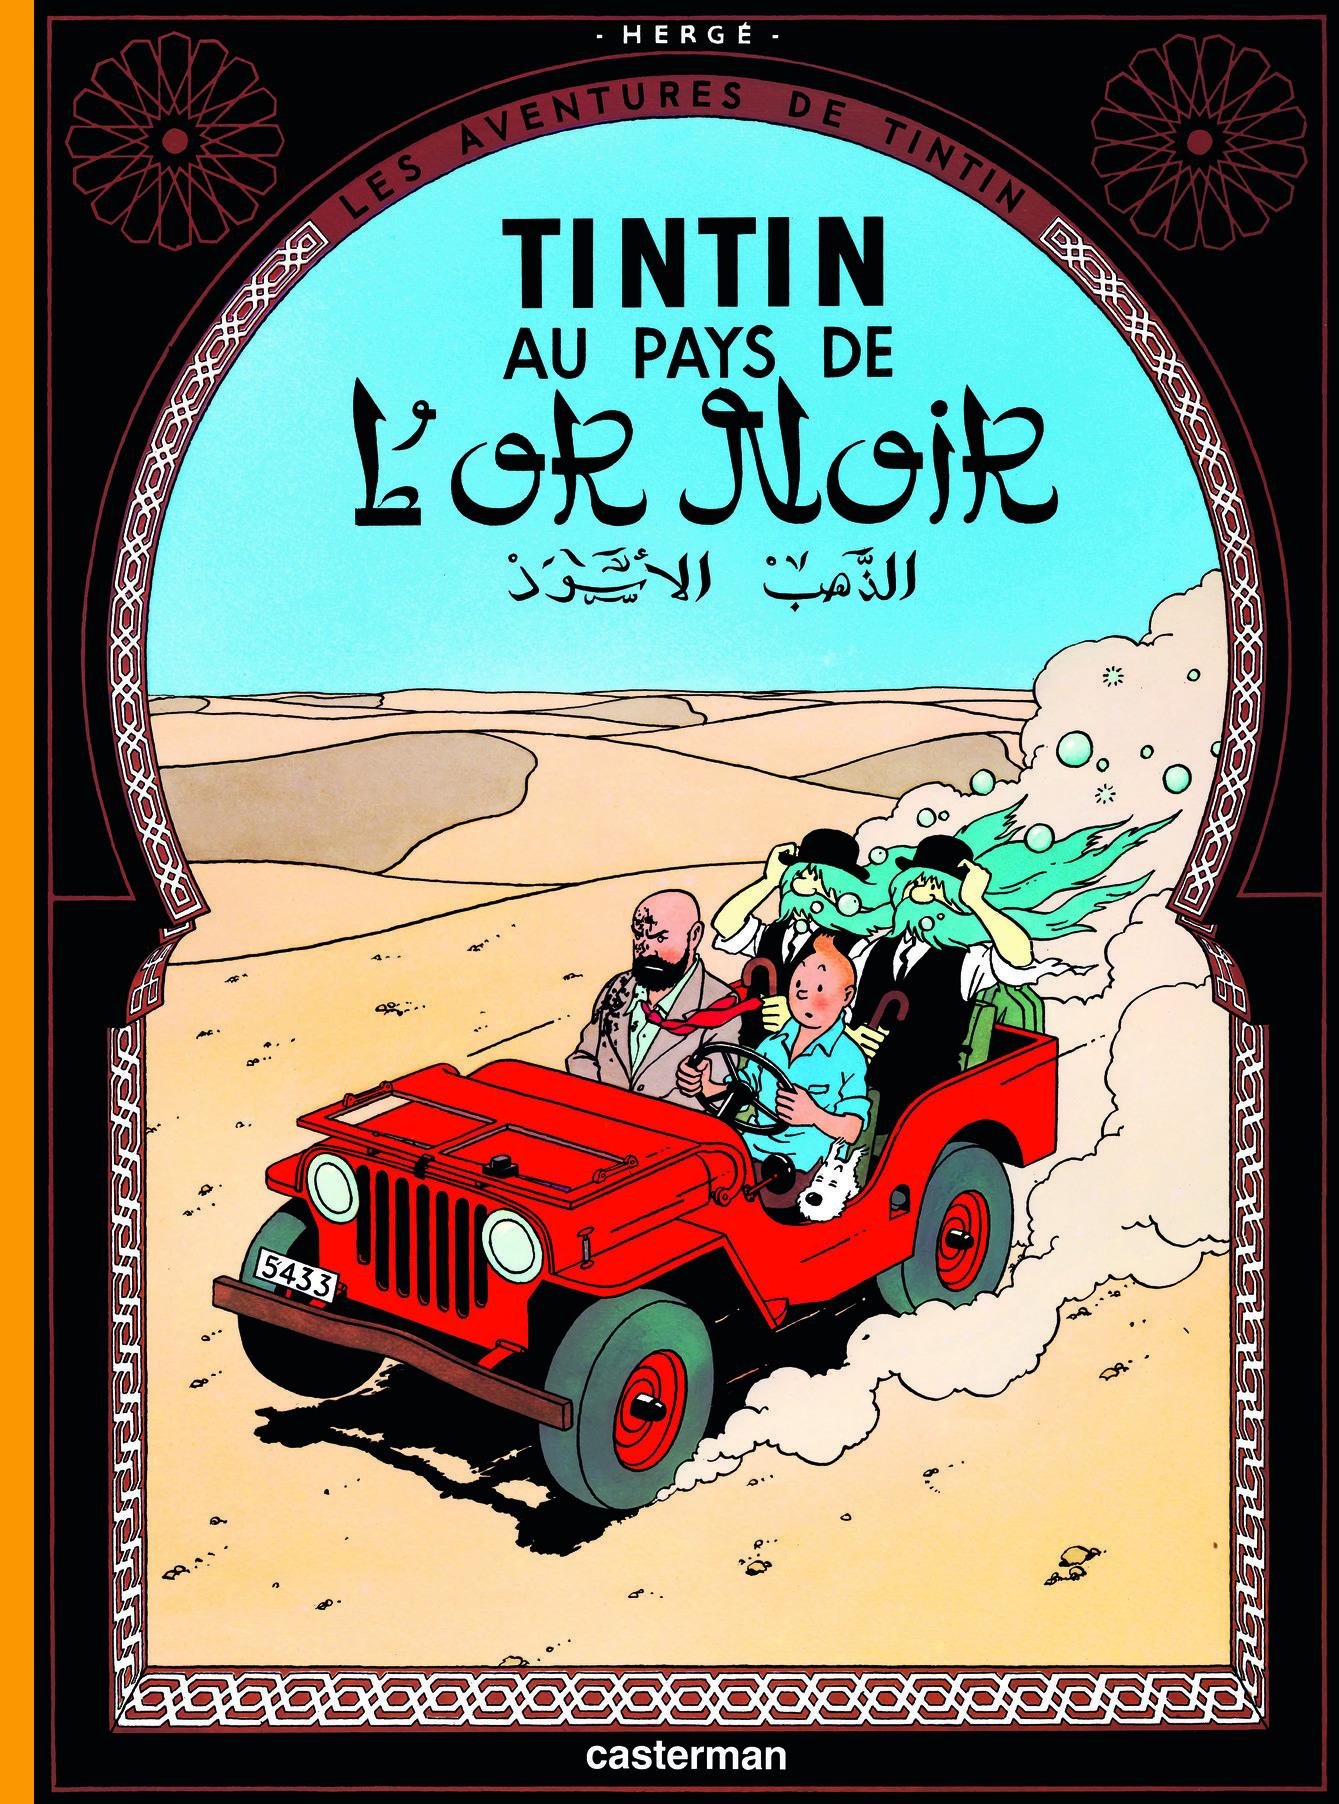 TINTIN - T15 - TINTIN AU PAYS DE L'OR NOIR